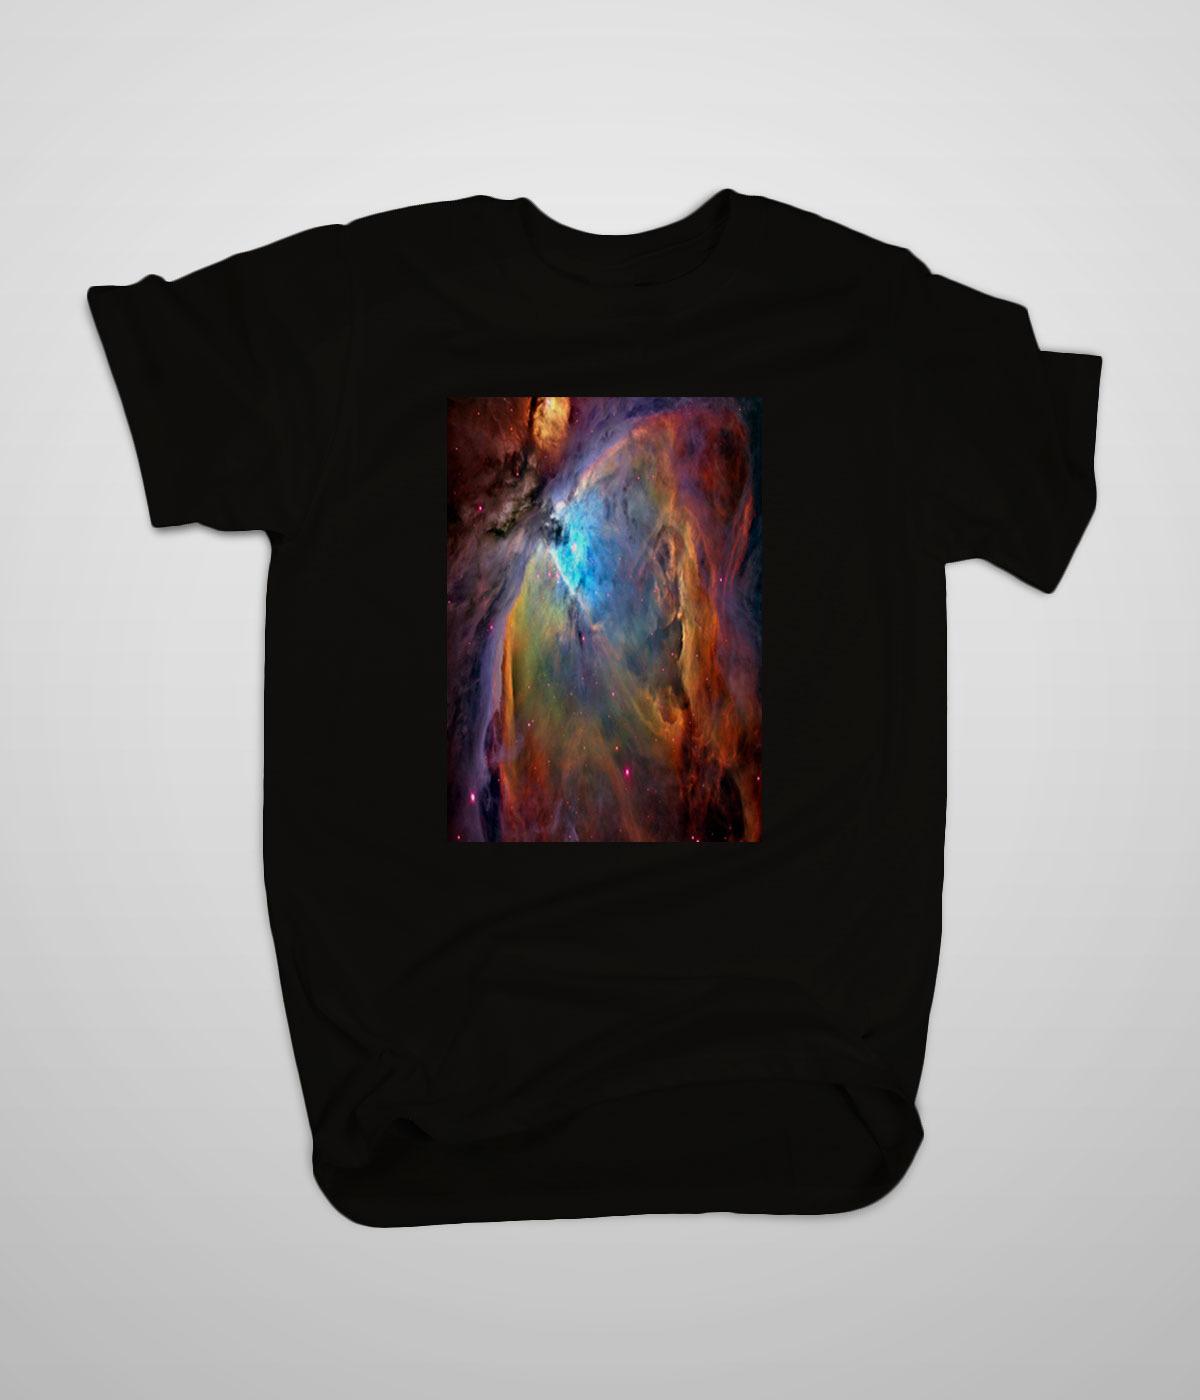 new nasa orion nebula t shirt s 3xl high quality custom t